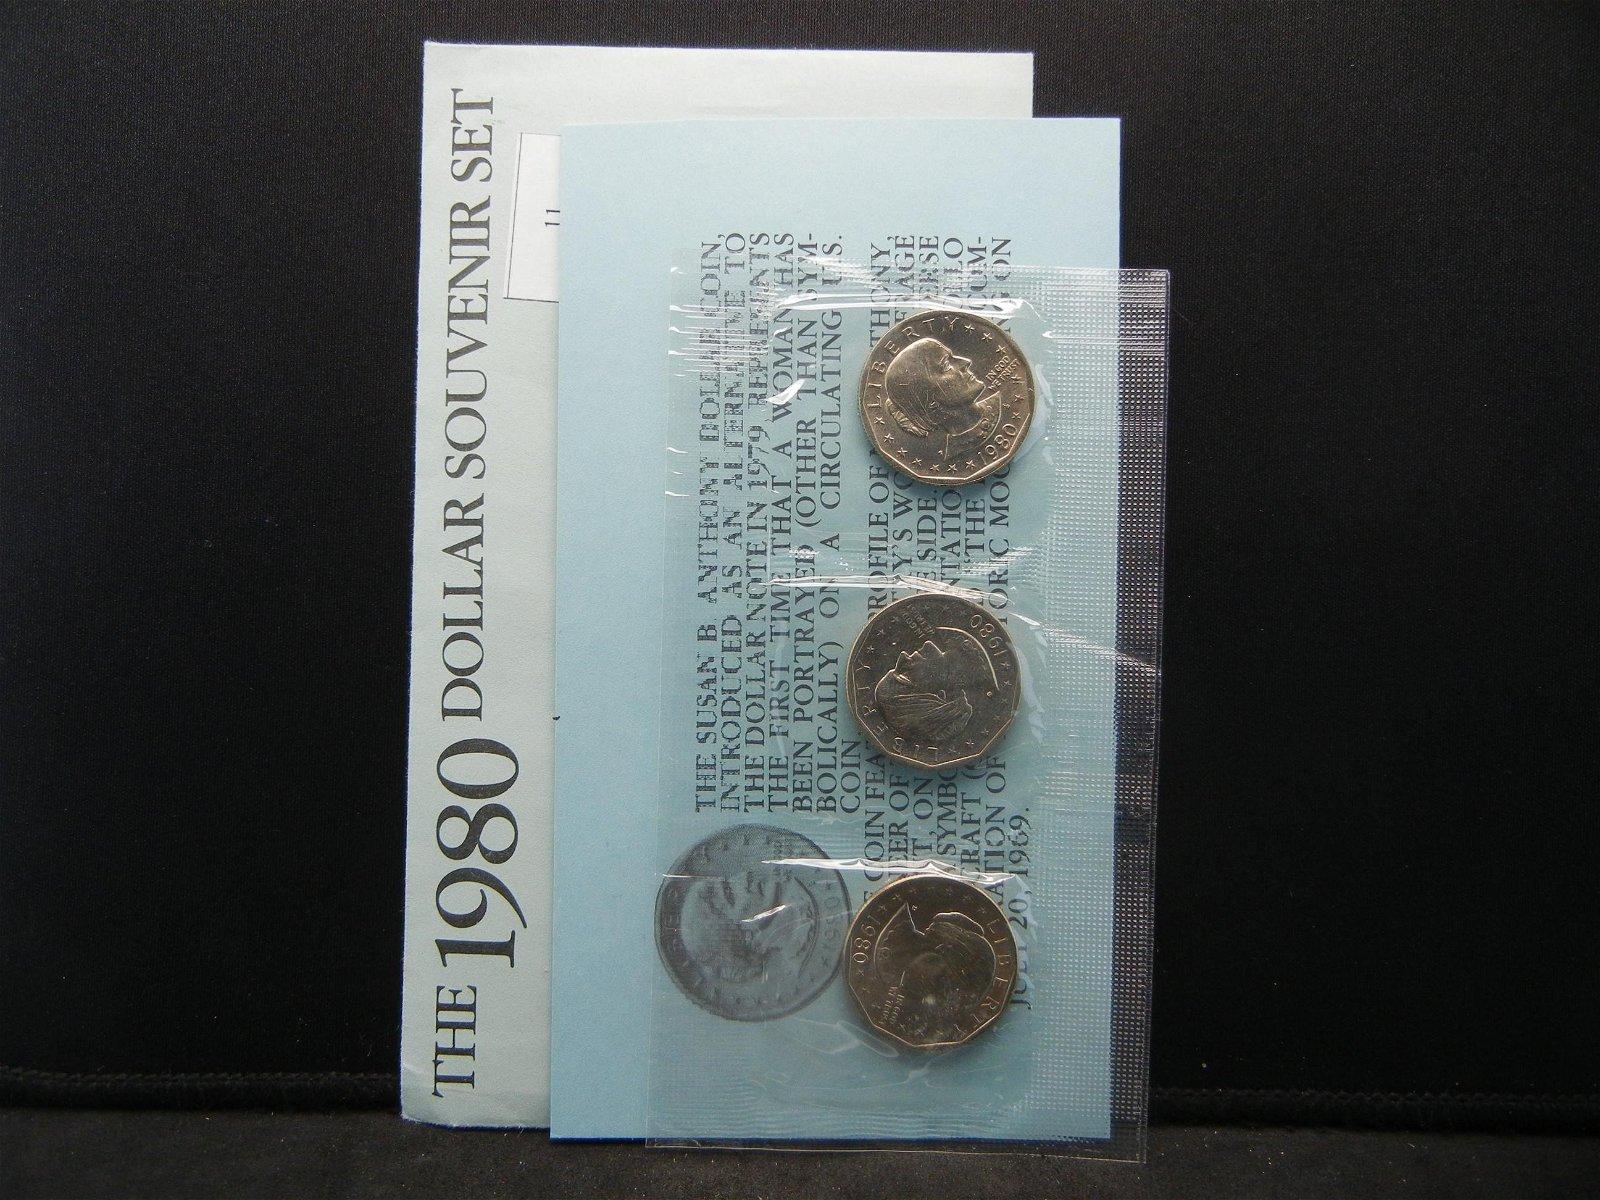 1980 United States Susan B. Anthony 3 Dollar Set w/